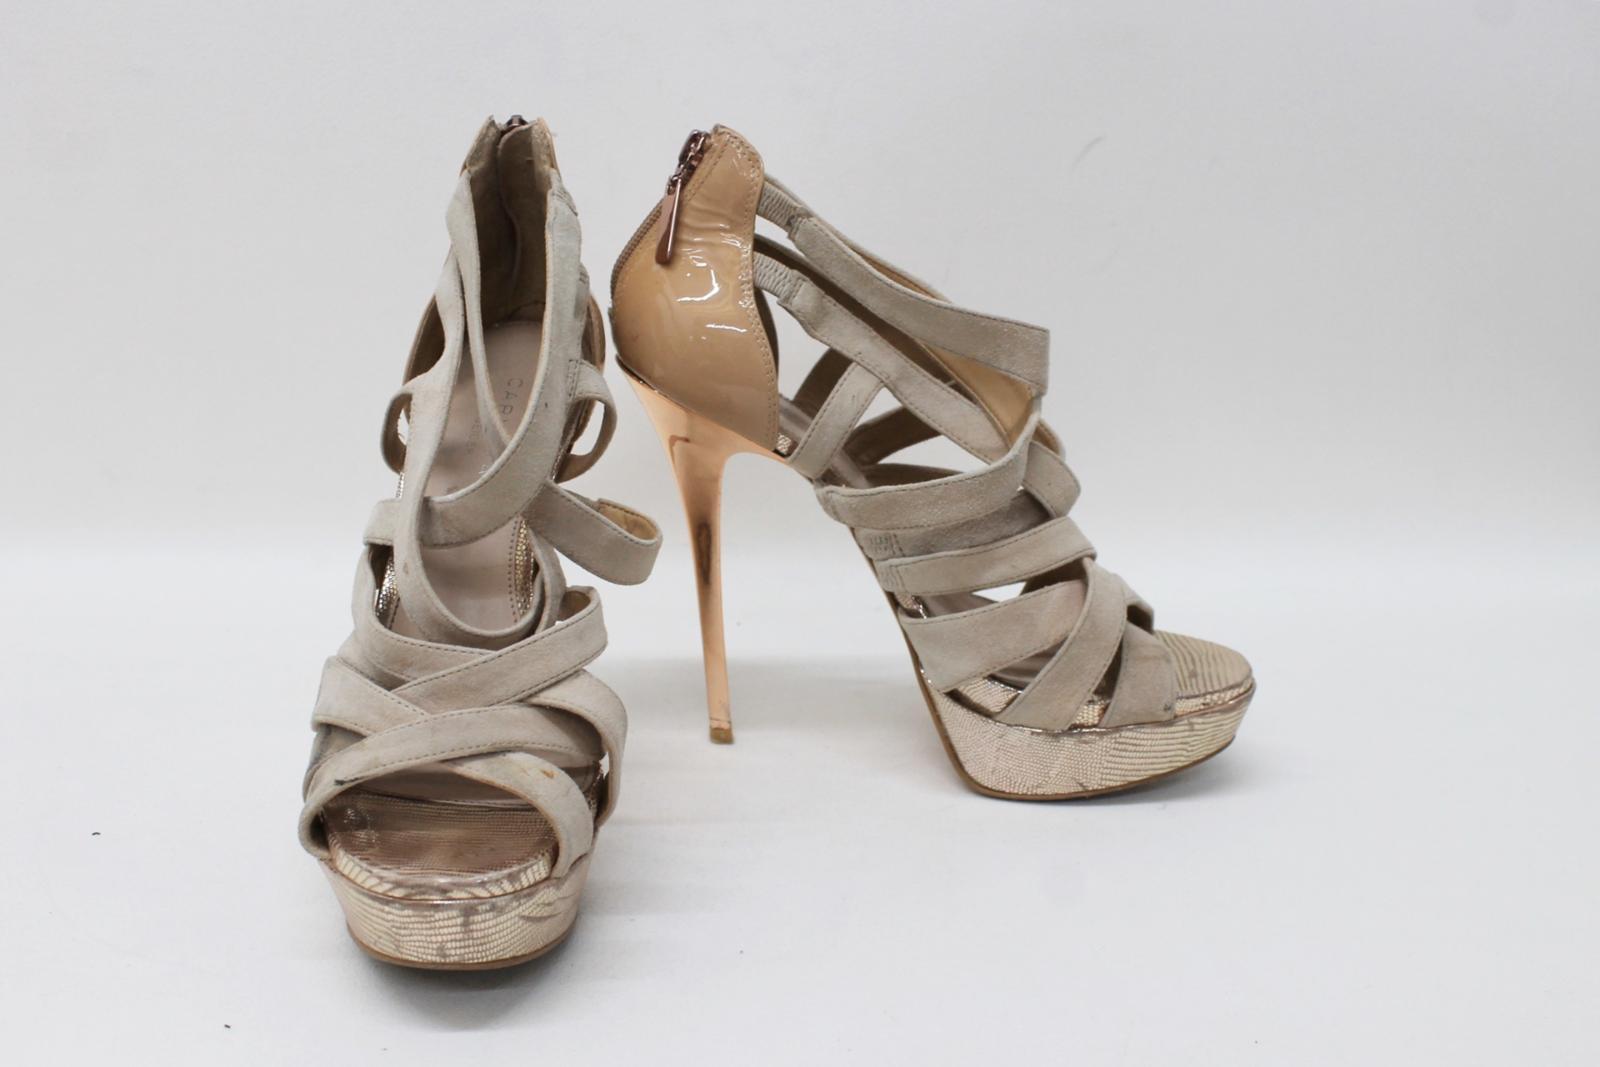 Carvela Eu41 Kurt Shoes Heeled Uk8 Suede Geiger Sandals High Beige Ladies 7RR1q5